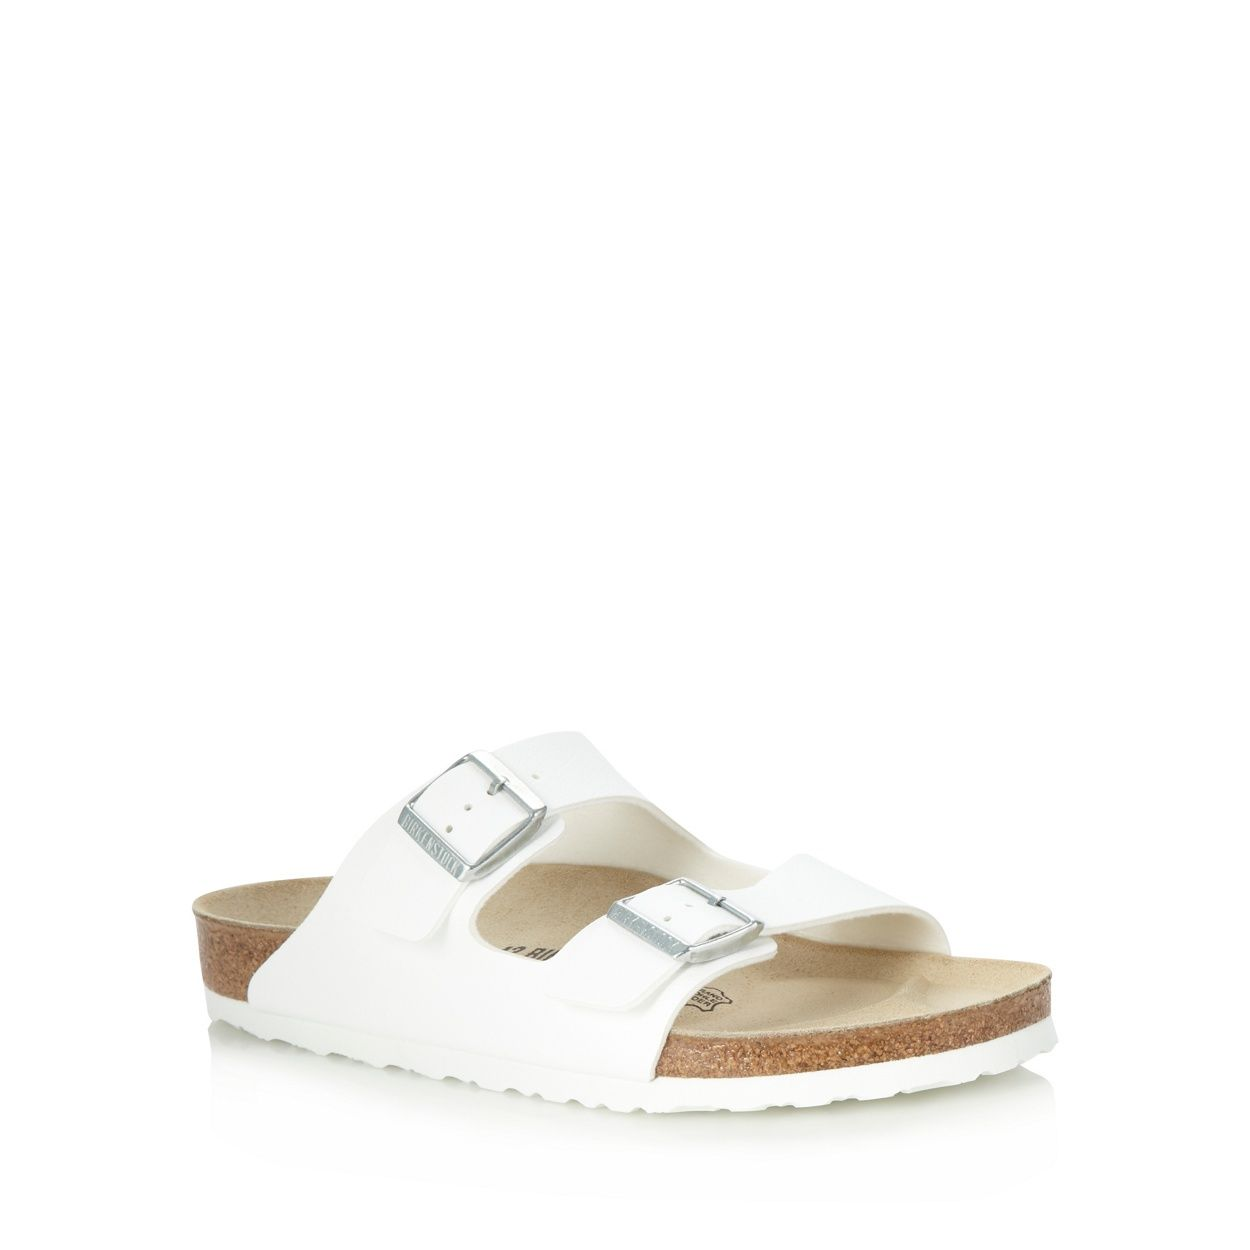 Birkenstock White 'Arizona' sandals